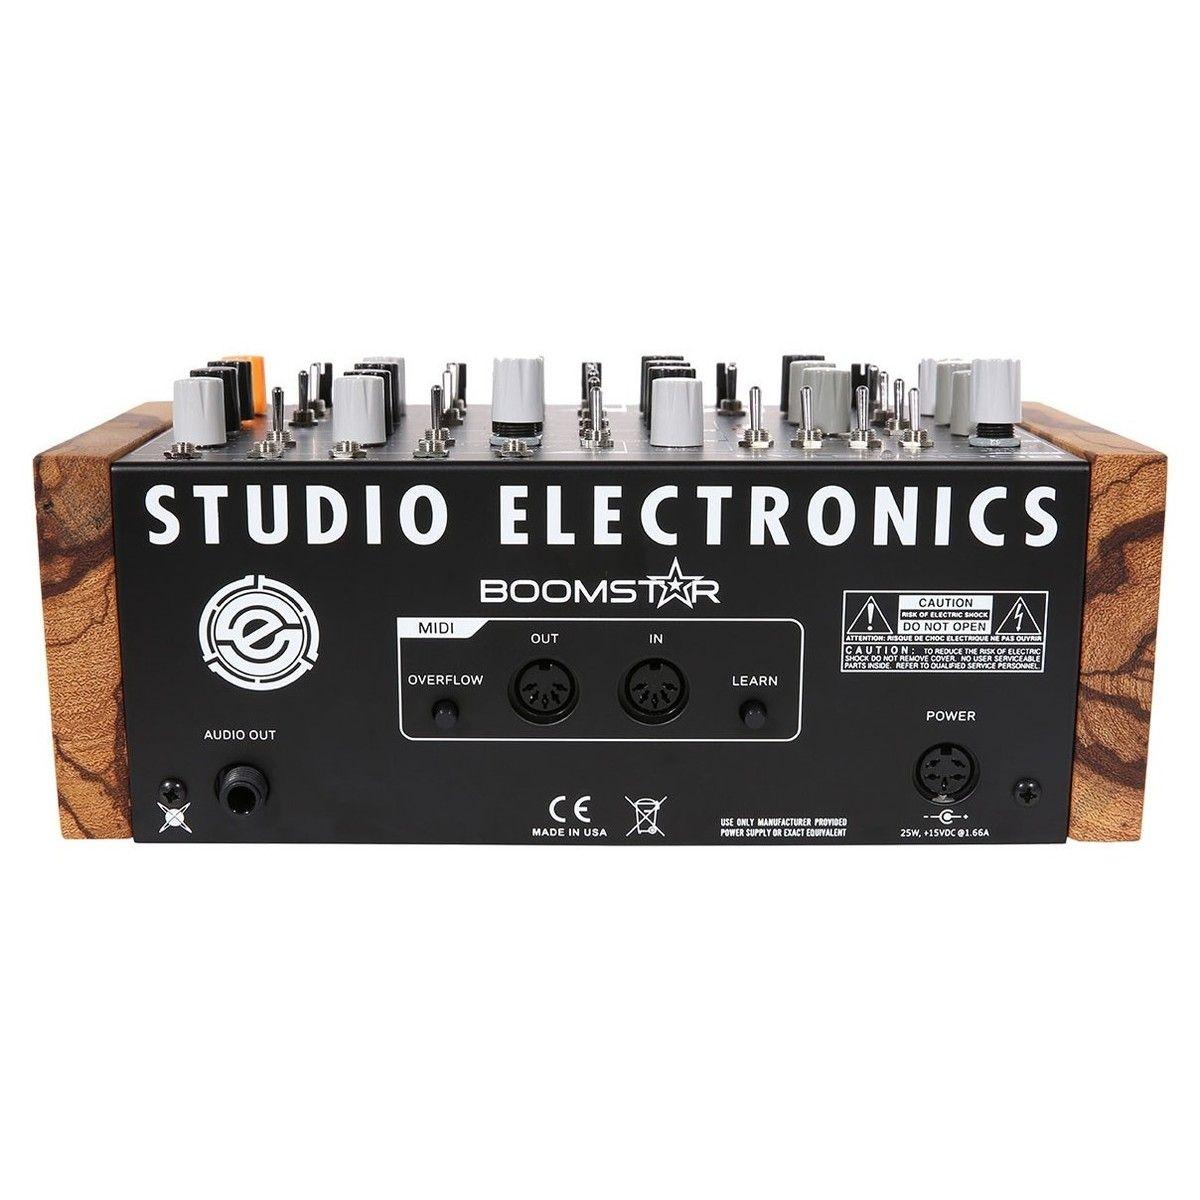 Studio Electronics Boomstar 5089 Desktop Analogue Synth (V2 - Moog)